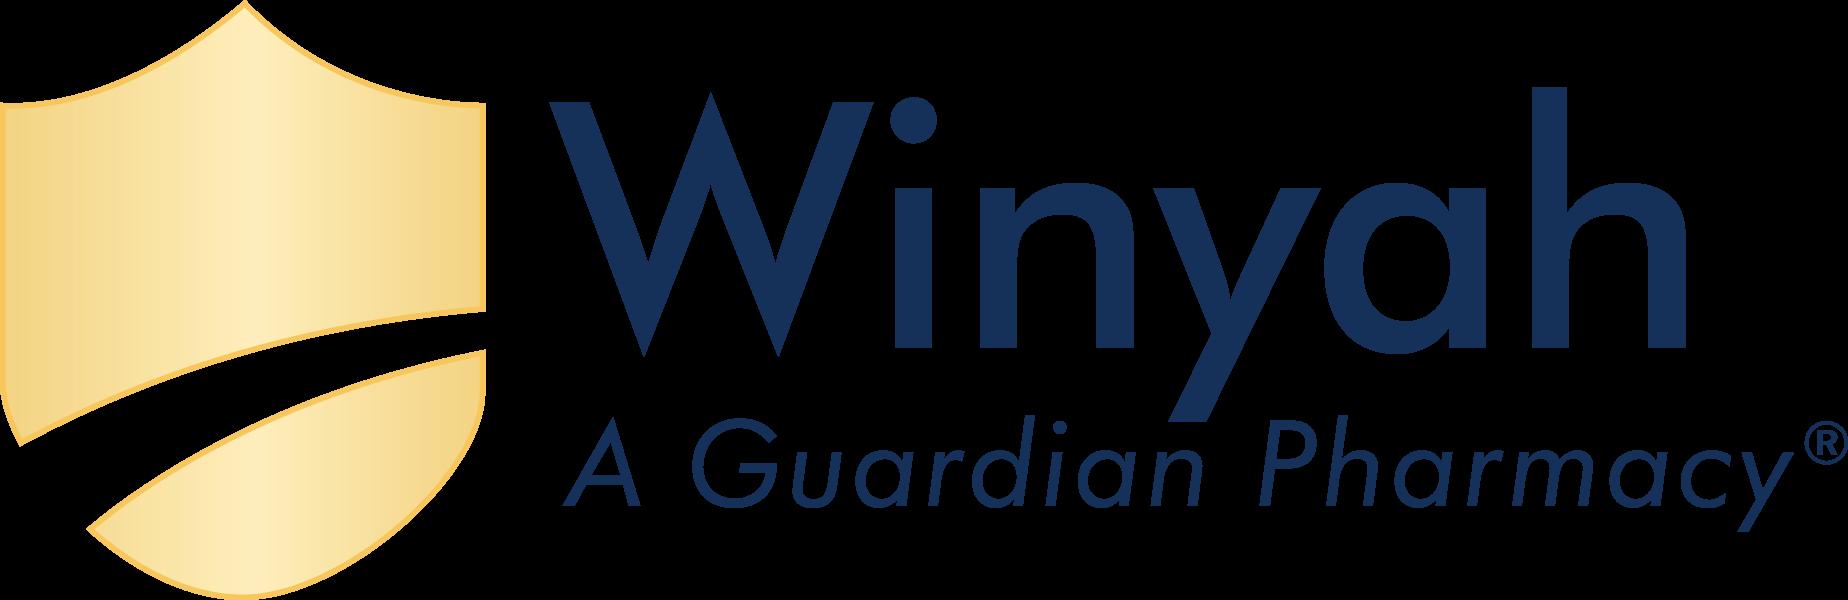 Guardian Pharmacy of Winyah